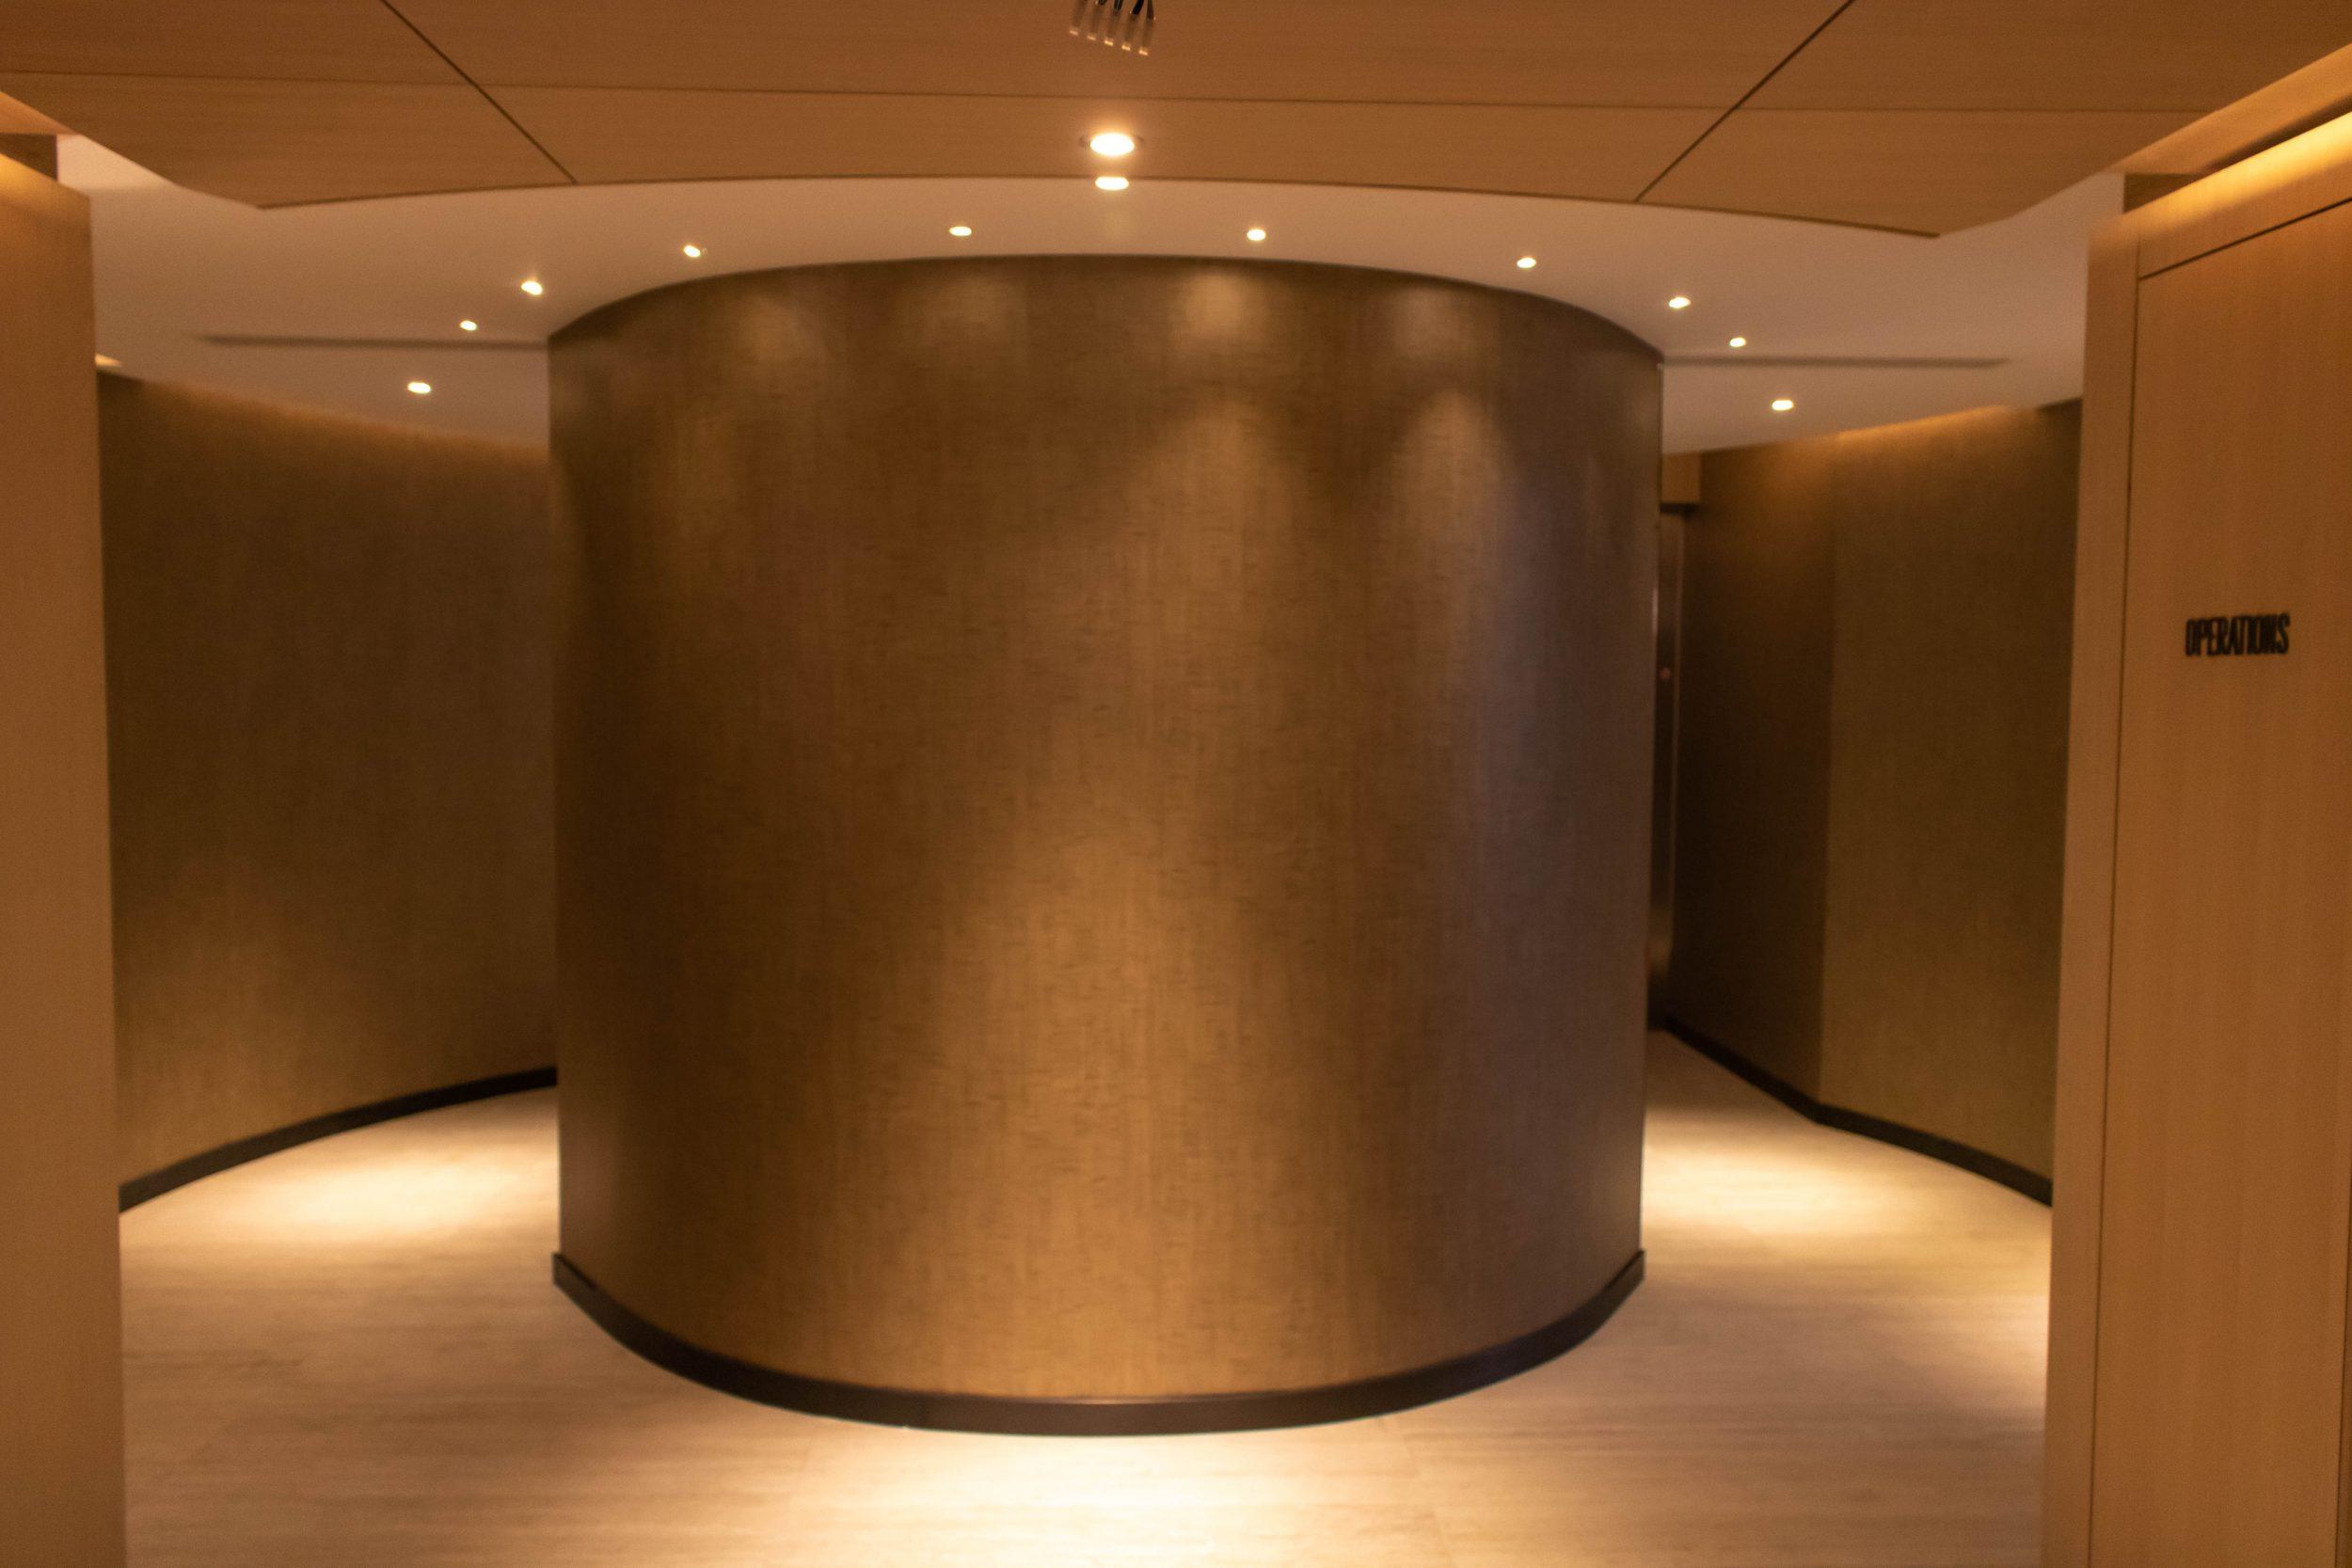 Kandd interior design